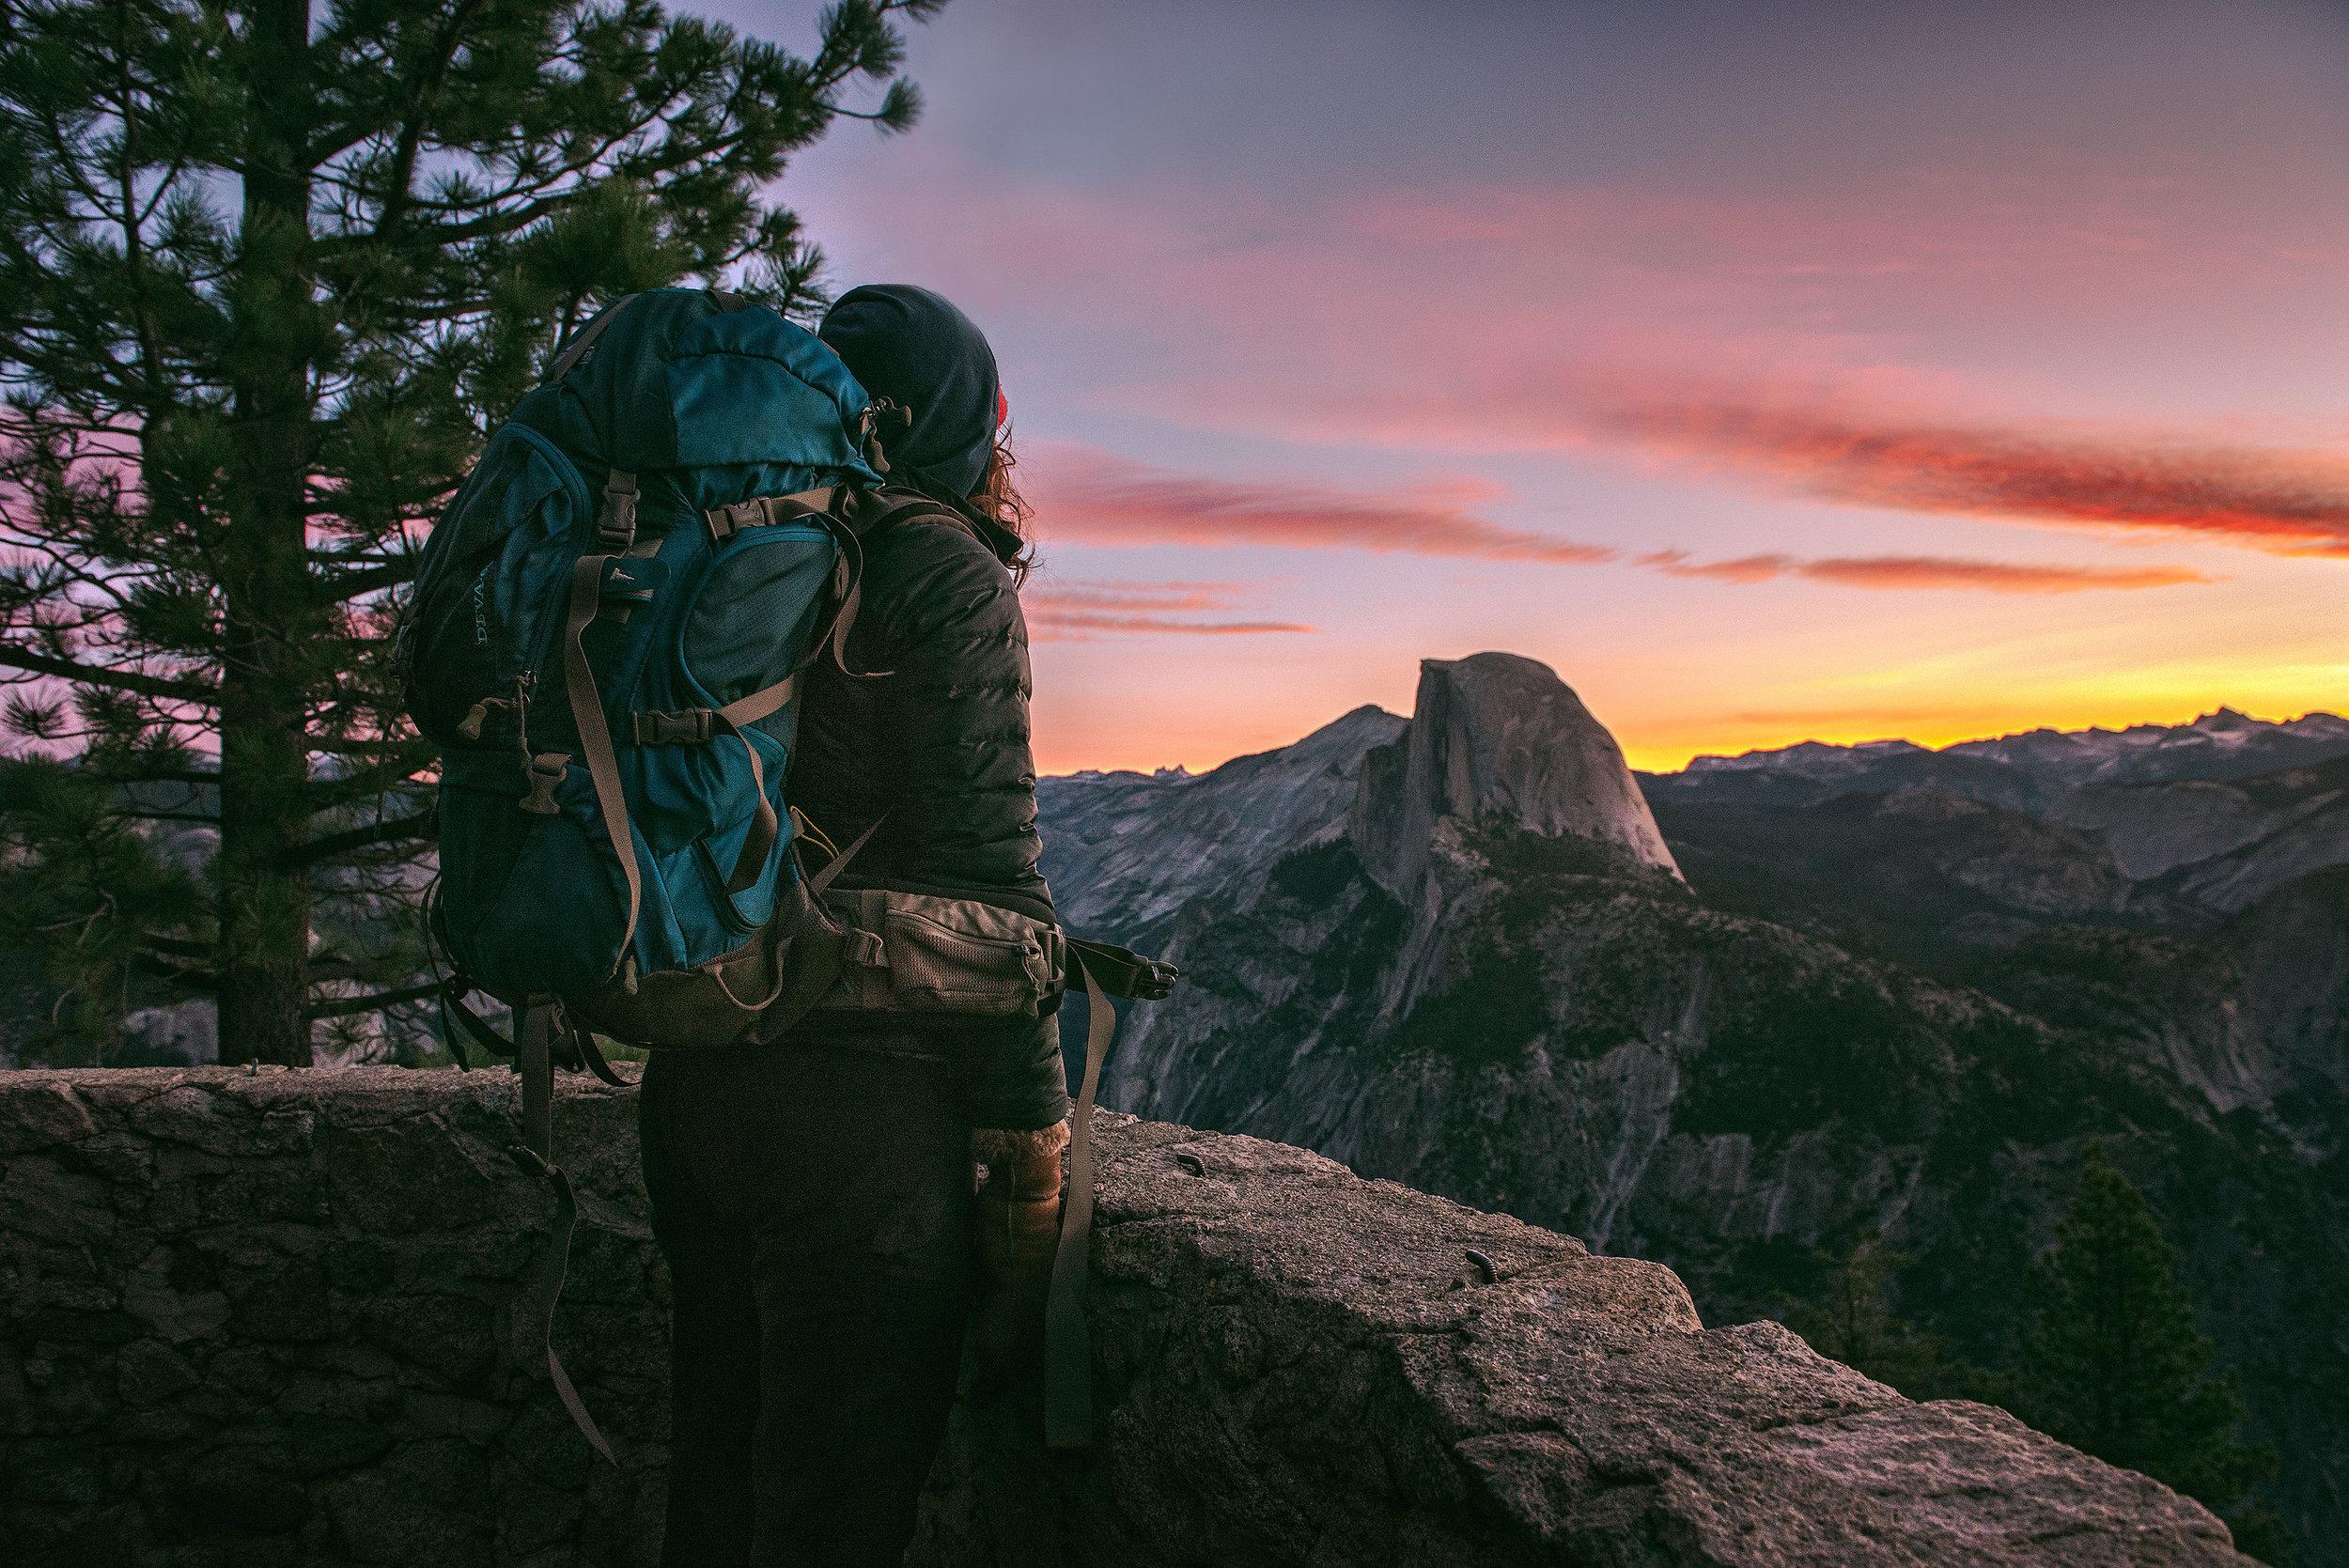 austin-trigg-yosemite-national-park-glacier-point-sunrise-geological-hut-valley-morning-adventure.jpg